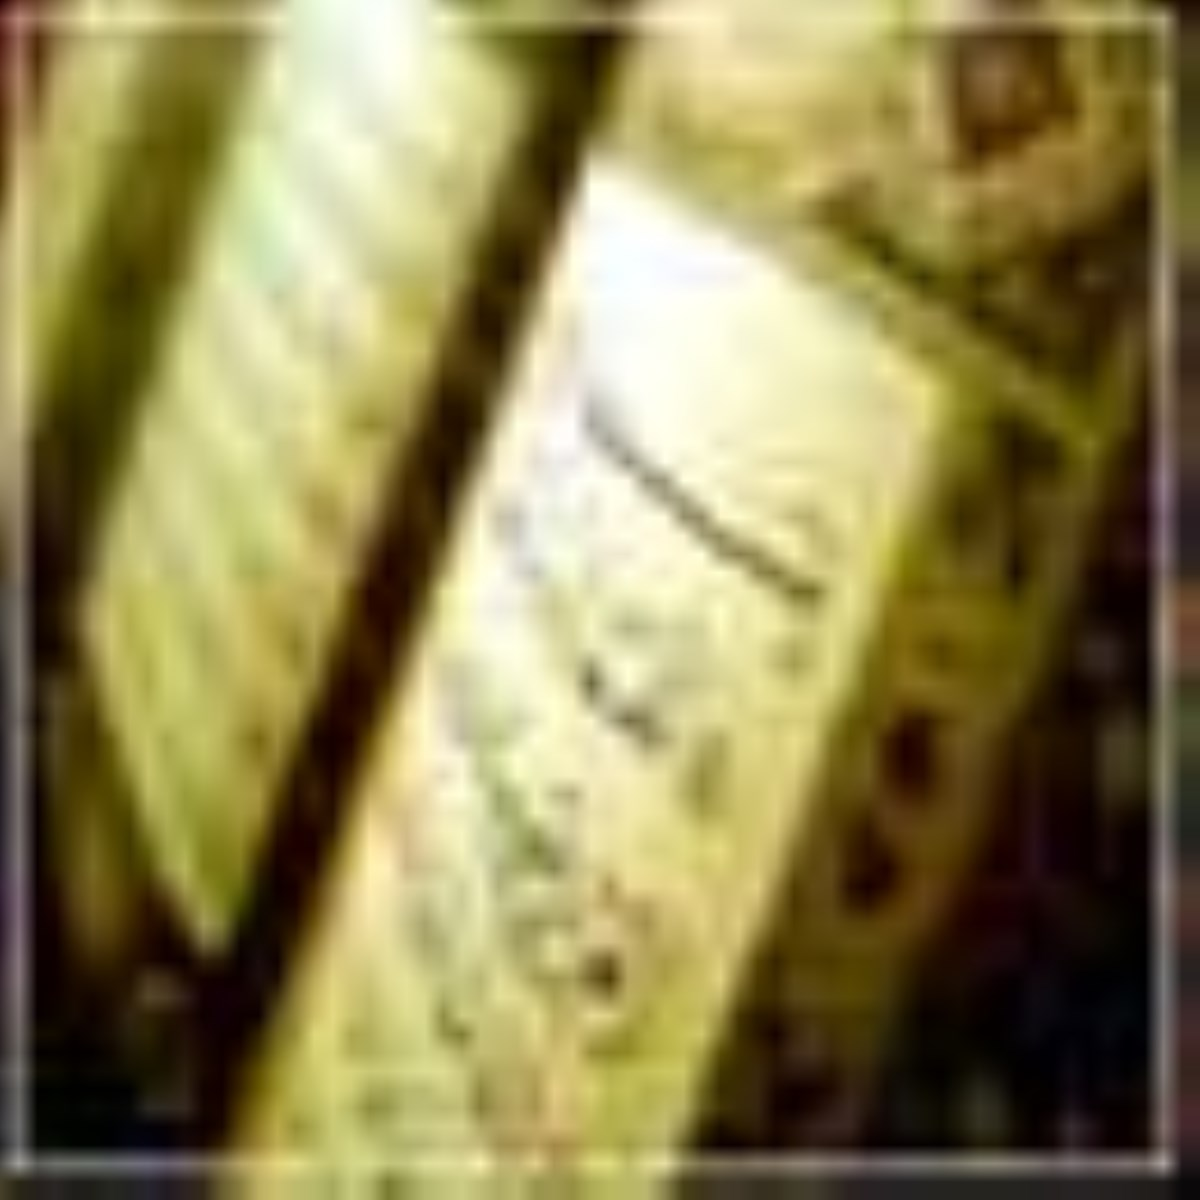 اعتبار روايات معصومان (علیهم السلام) در تفسير قرآن